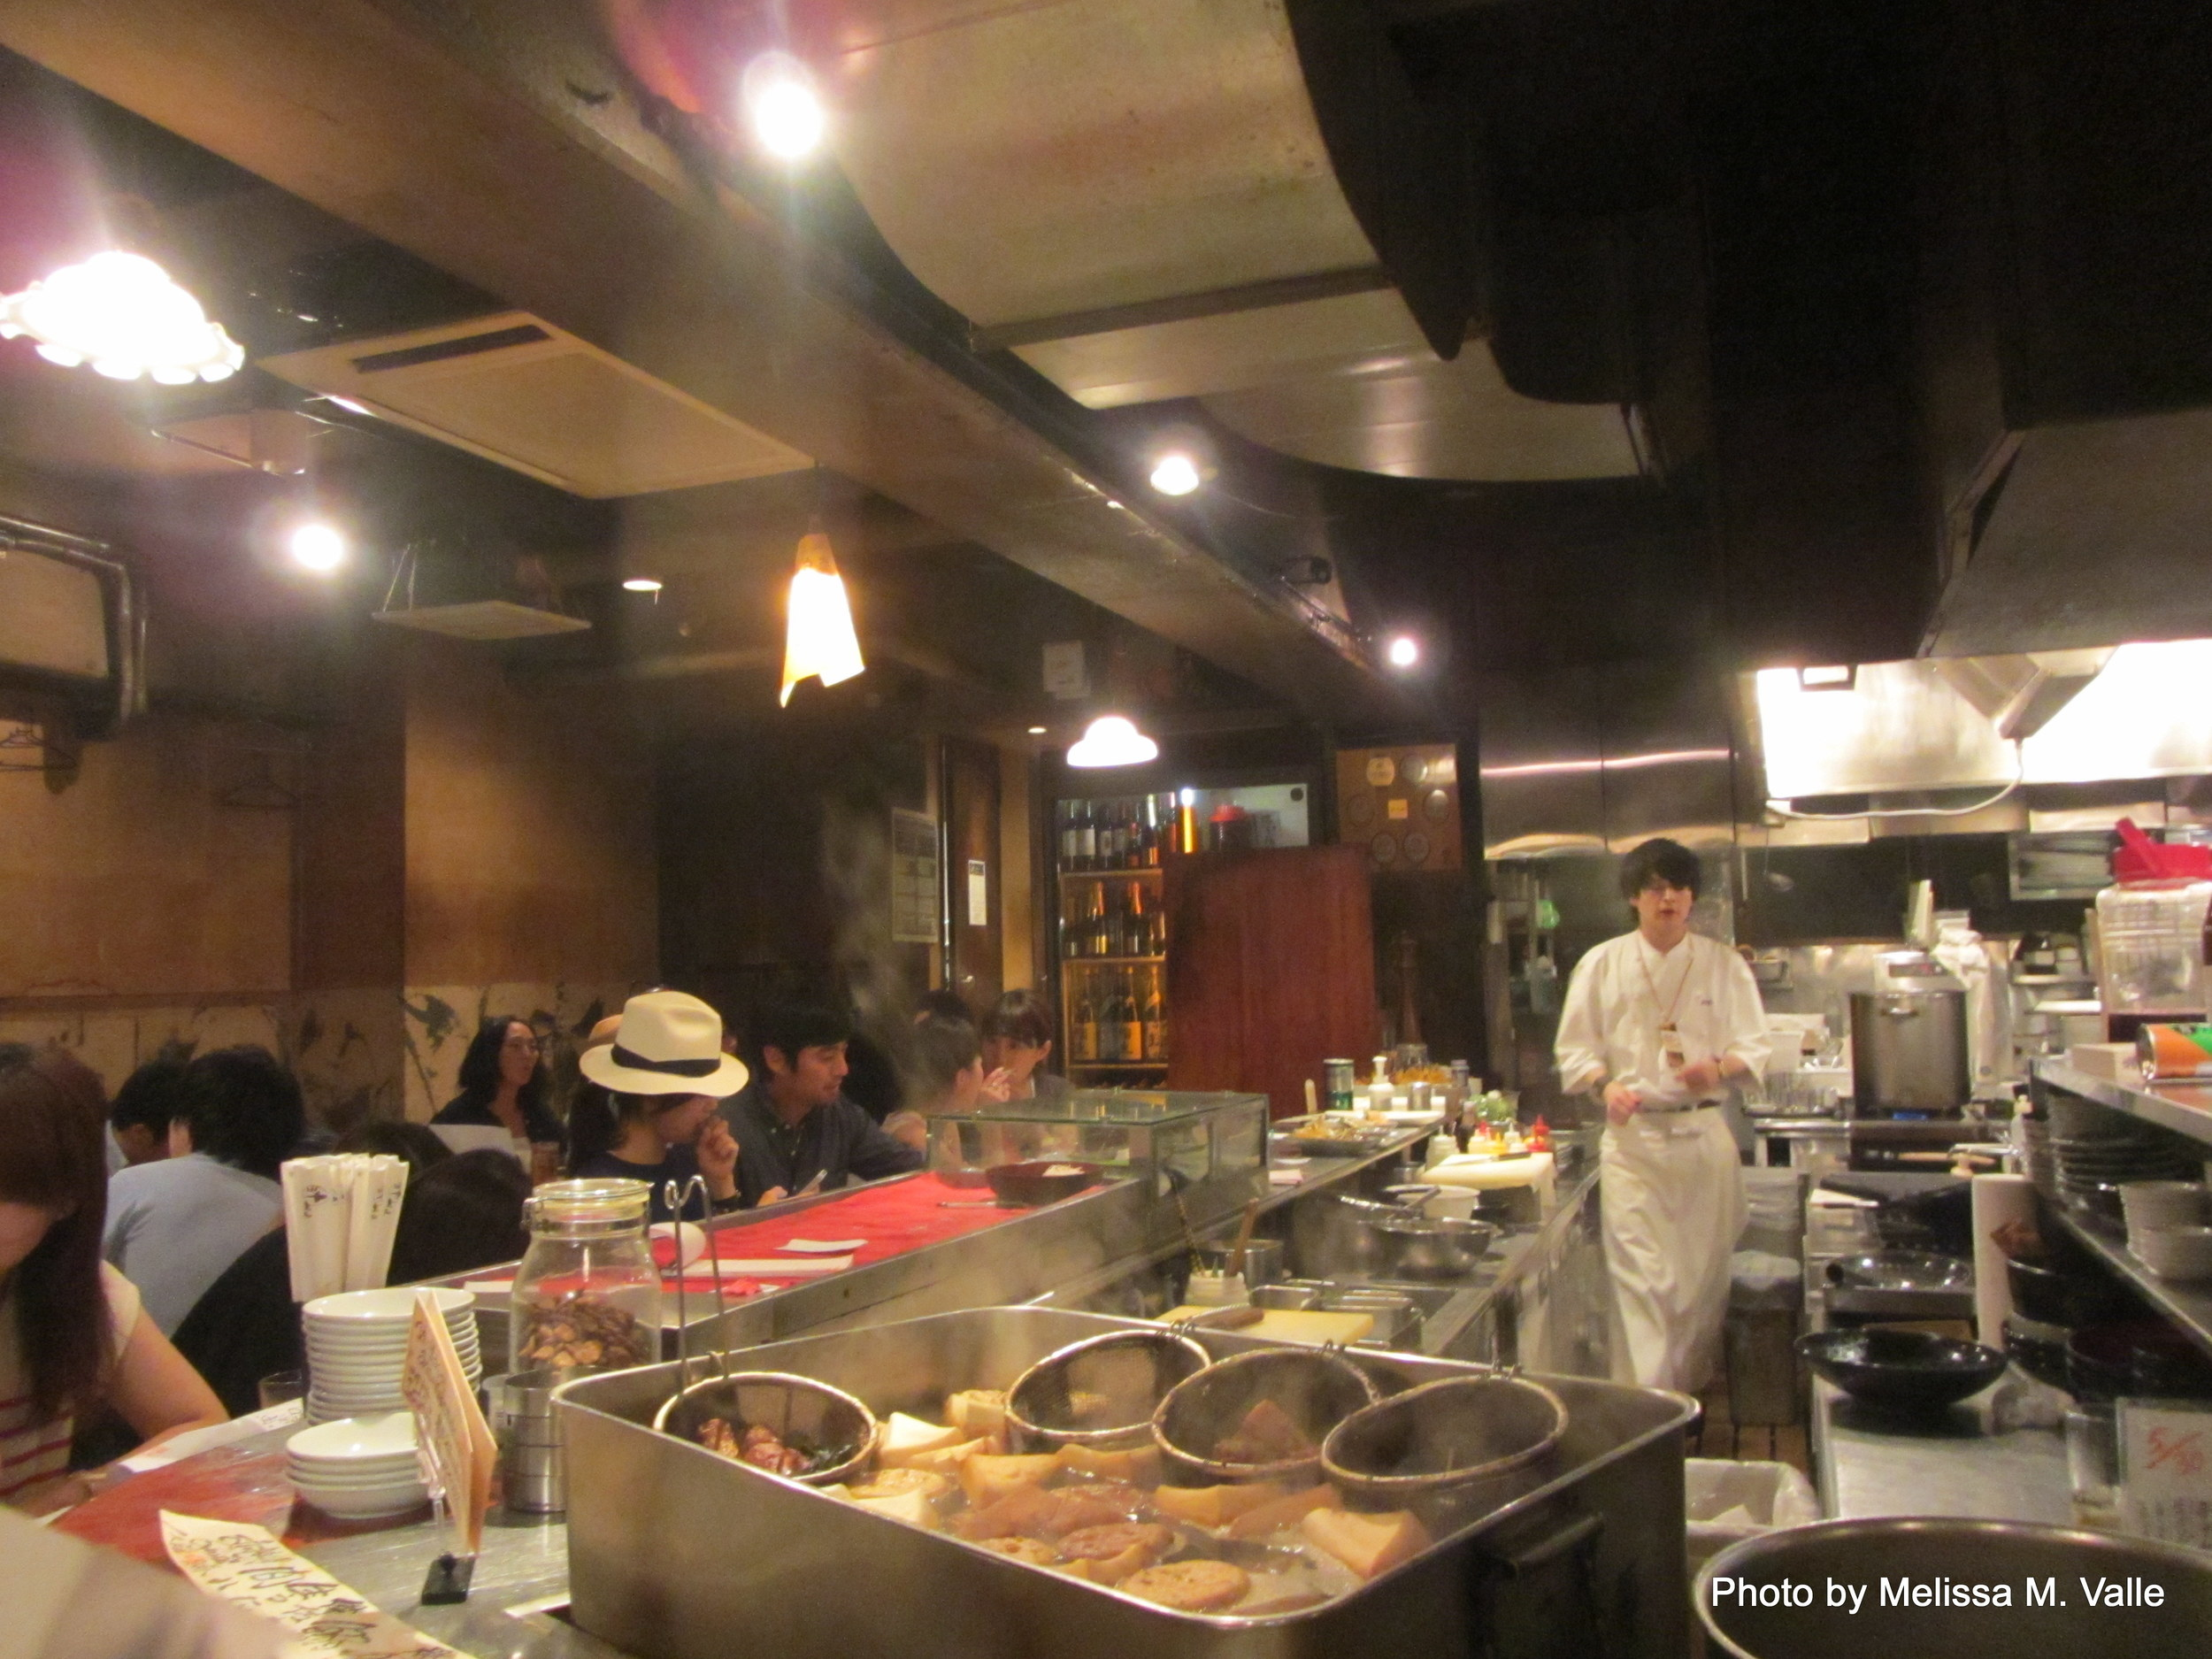 7.17.14 Tokyo, Japan- Hanging with Nelson Saldaña in Shimokitazawa and Shibuya (6).JPG